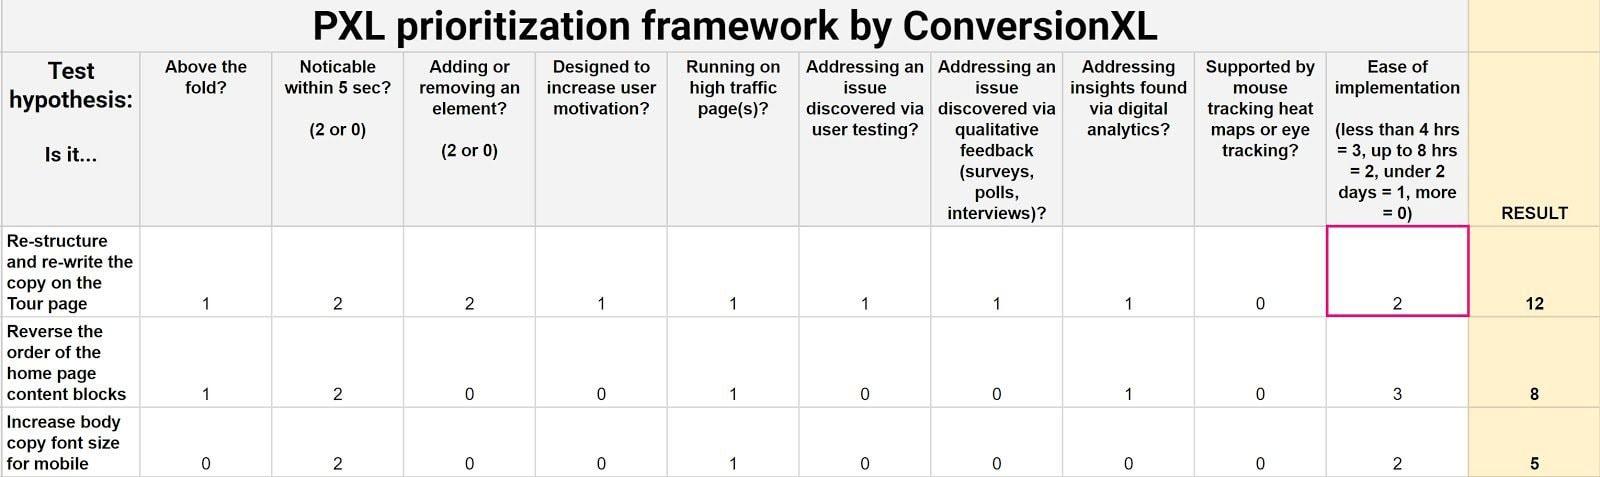 PXL Prioritization Framework